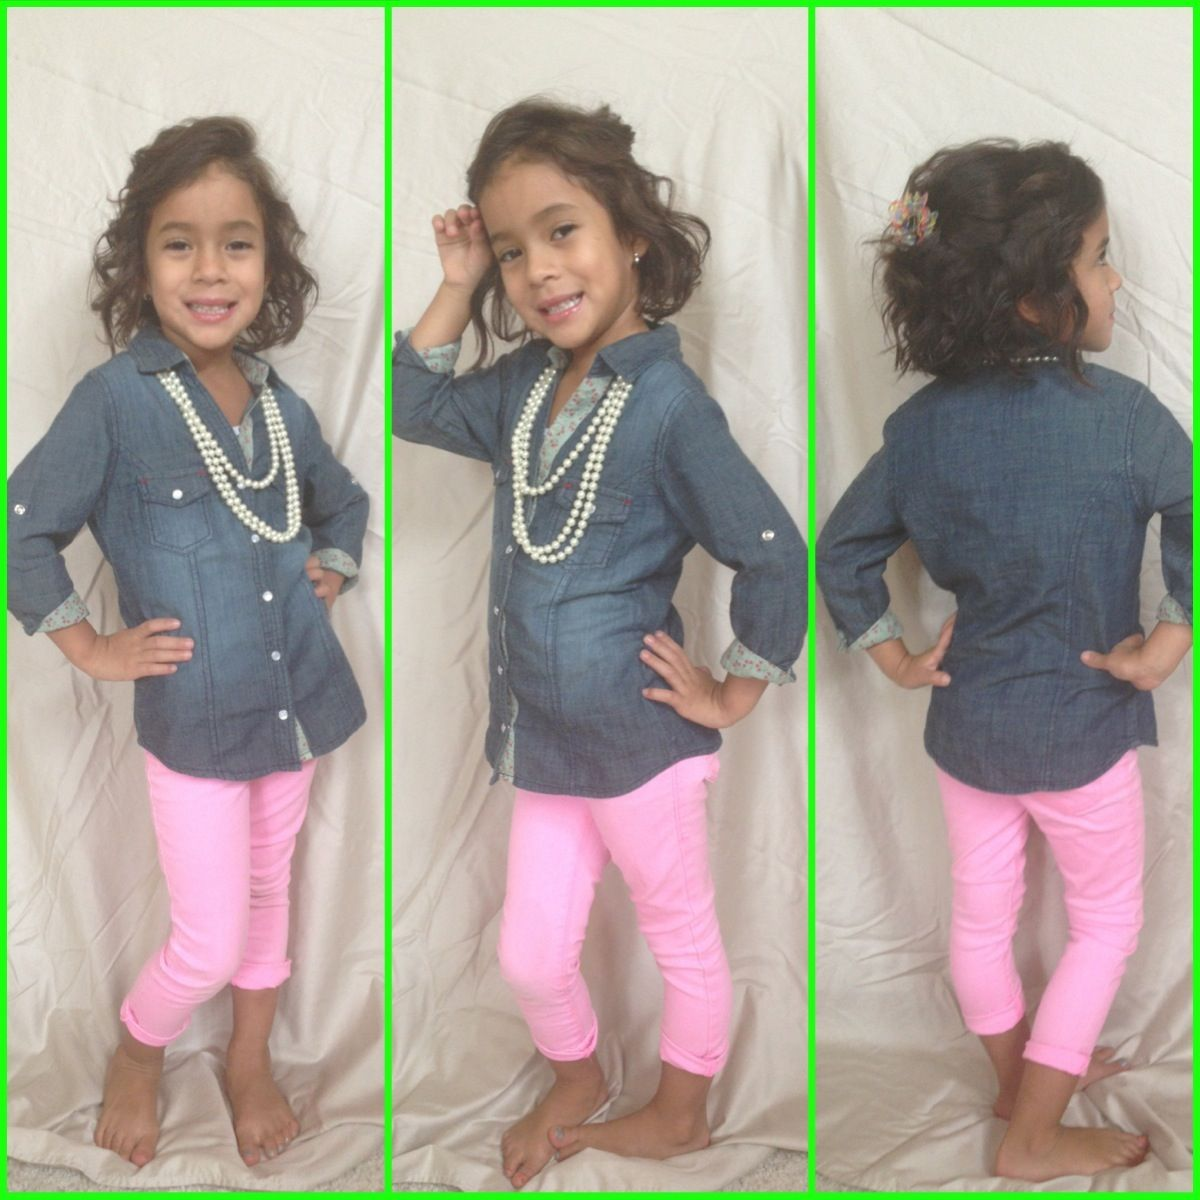 kindergarten girl side Kindergarten fashion, denim, pink jeans, curly hair, and pearls. Too cute